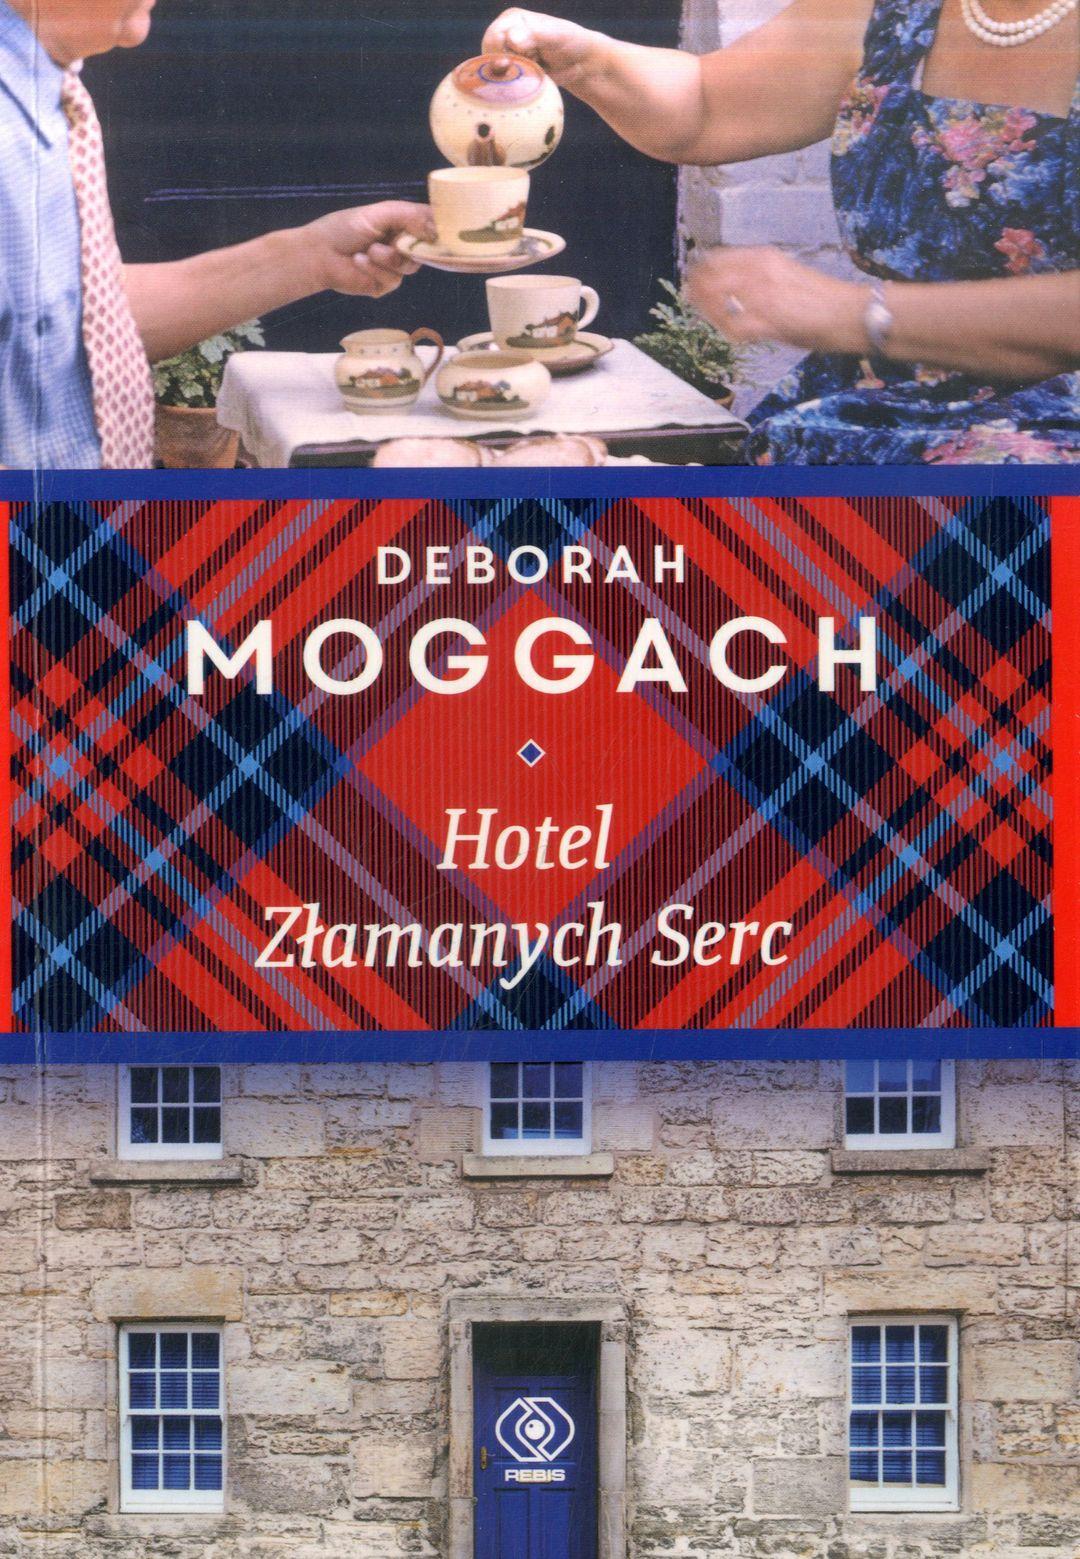 Moggah Deborah – Hotel Złamanych Serc